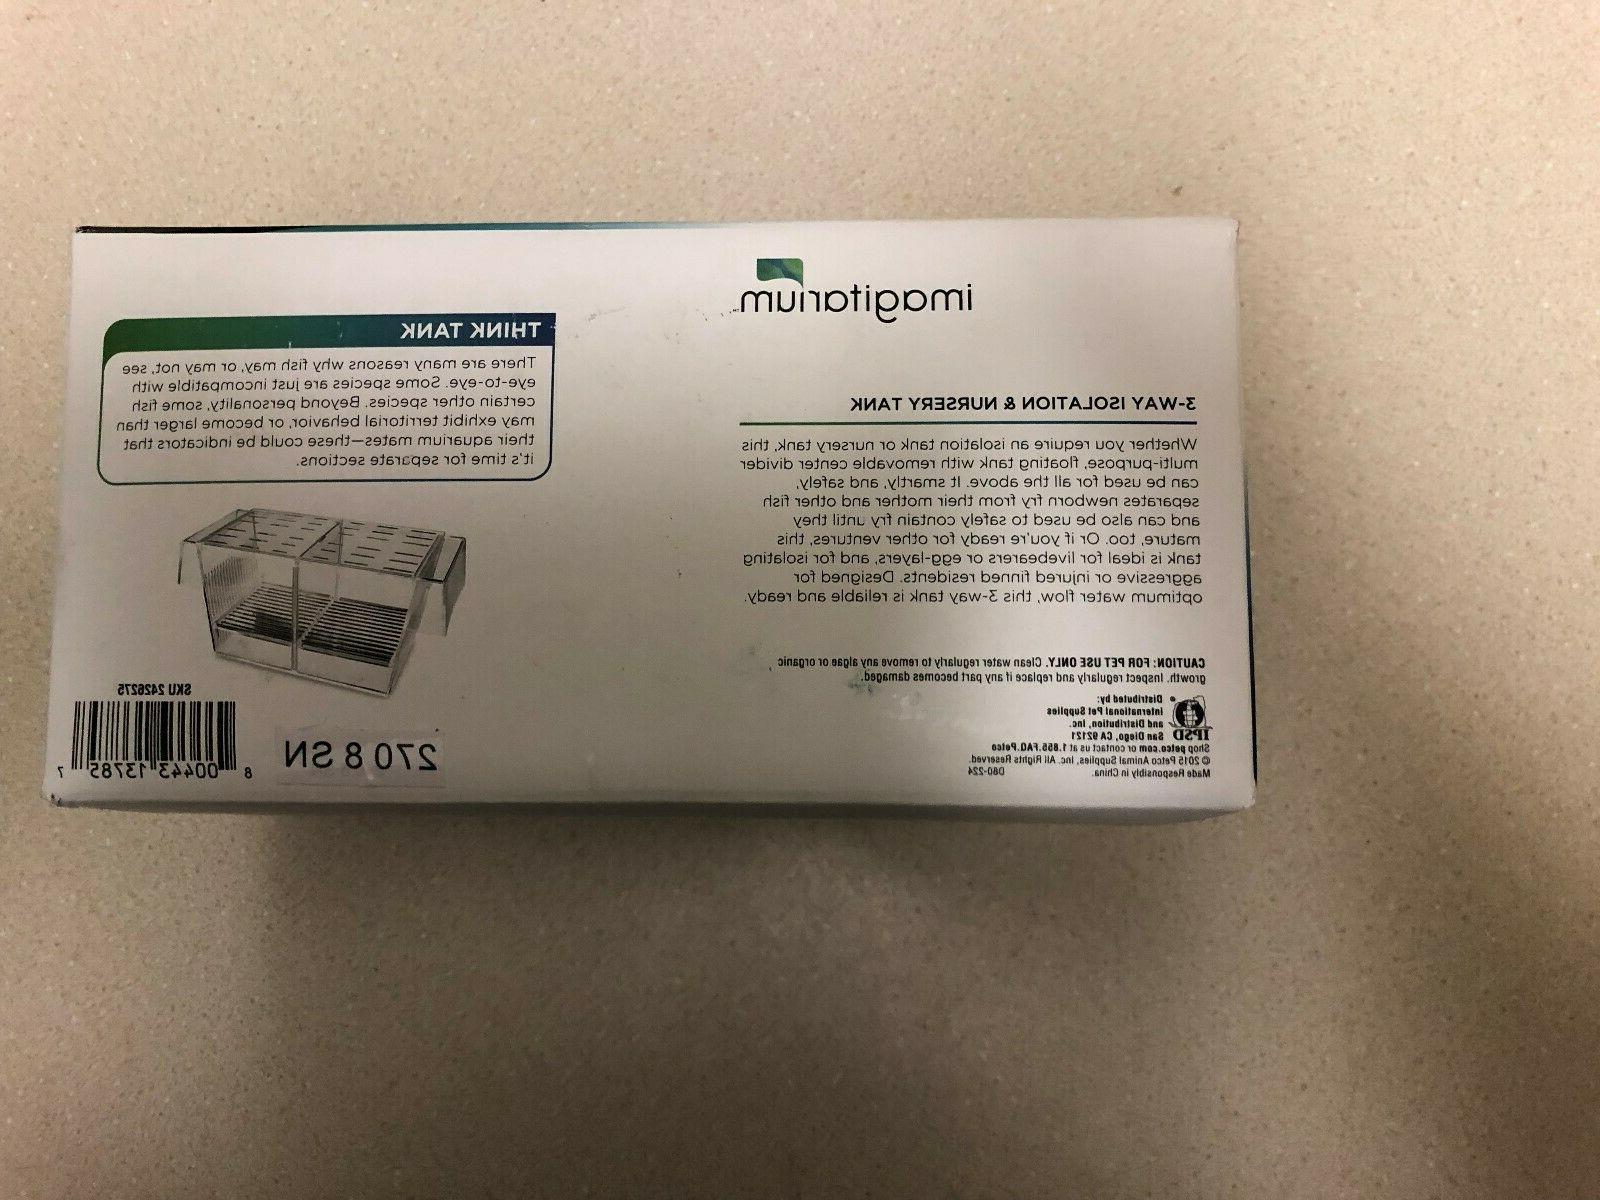 Imagitarium 3-Way Isolation Nursery Tank New